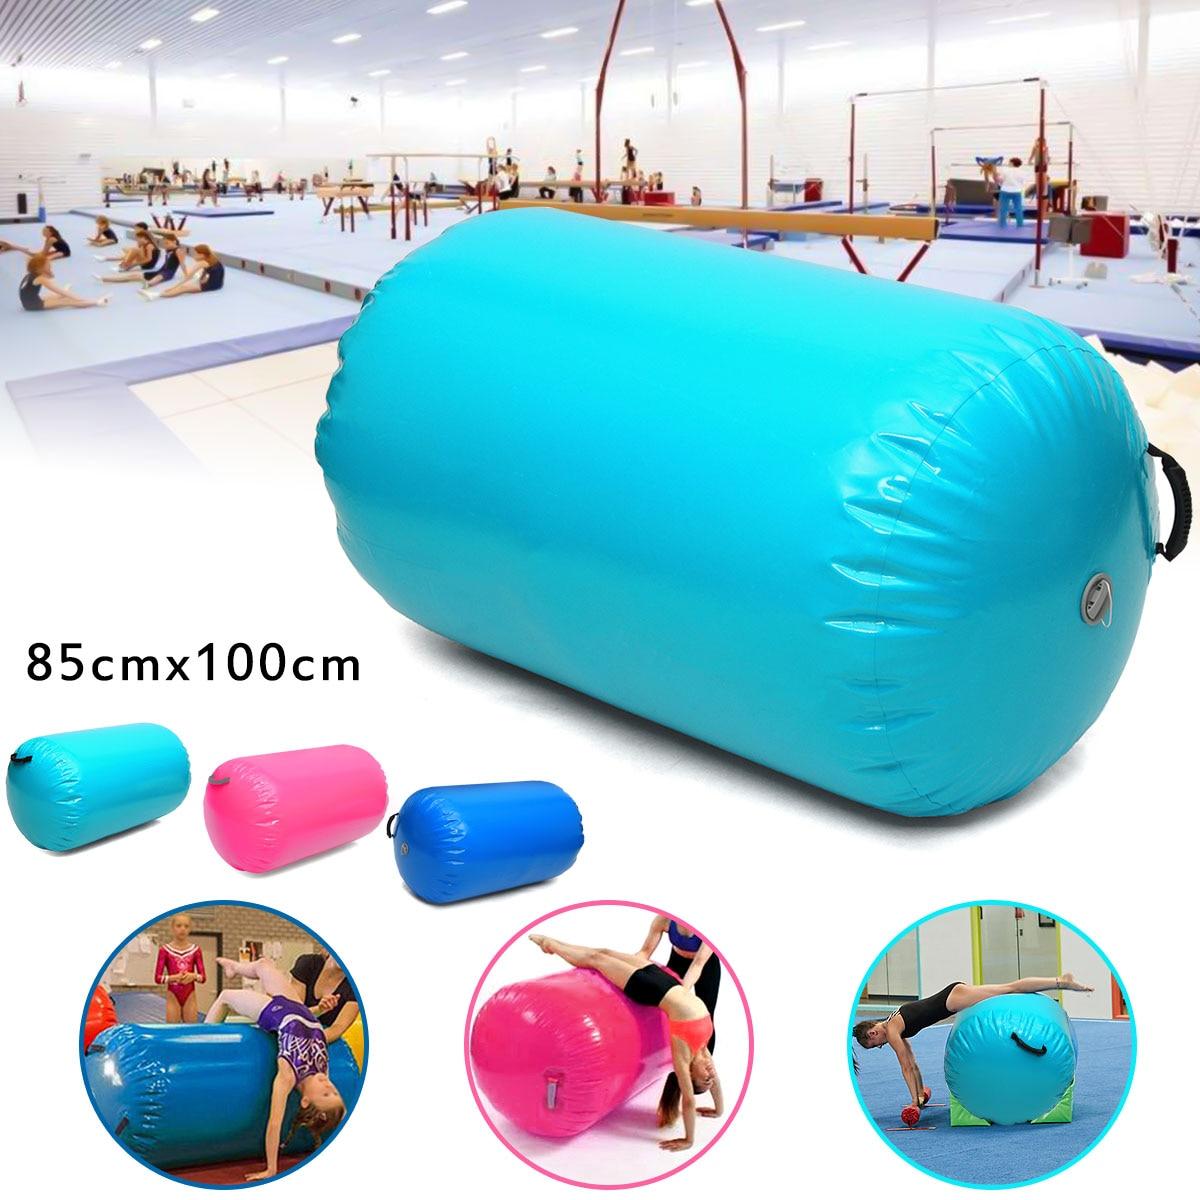 85x100 CM Gofun inflable personalizado PVC redondo deporte gimnasia gimnasio alfombra de aire suelo casa gimnasio ejercicio aire inflable colchoneta de haz